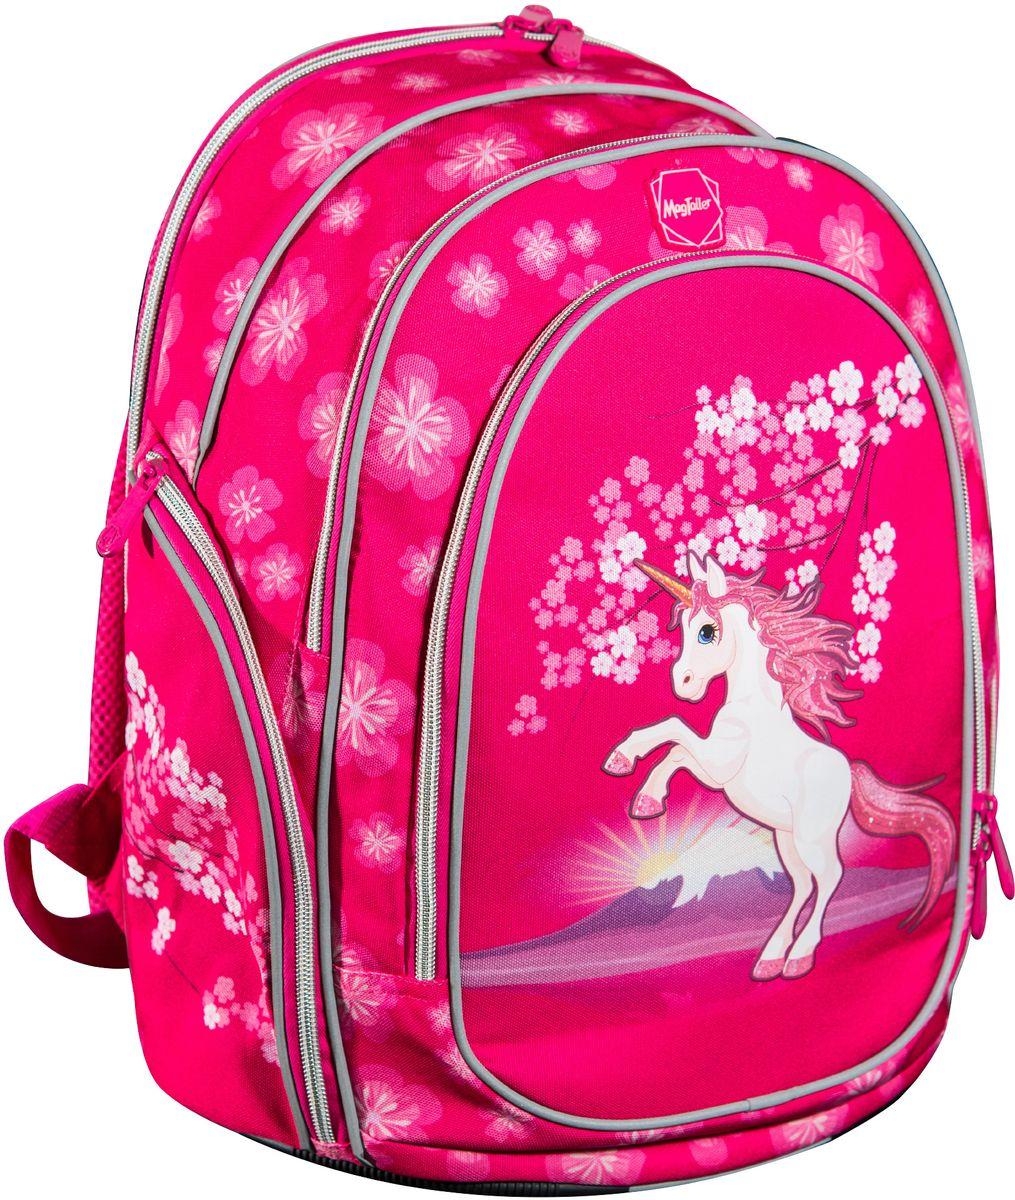 MagTaller Ранец школьный Cosmo llI Unicorn 20412-45